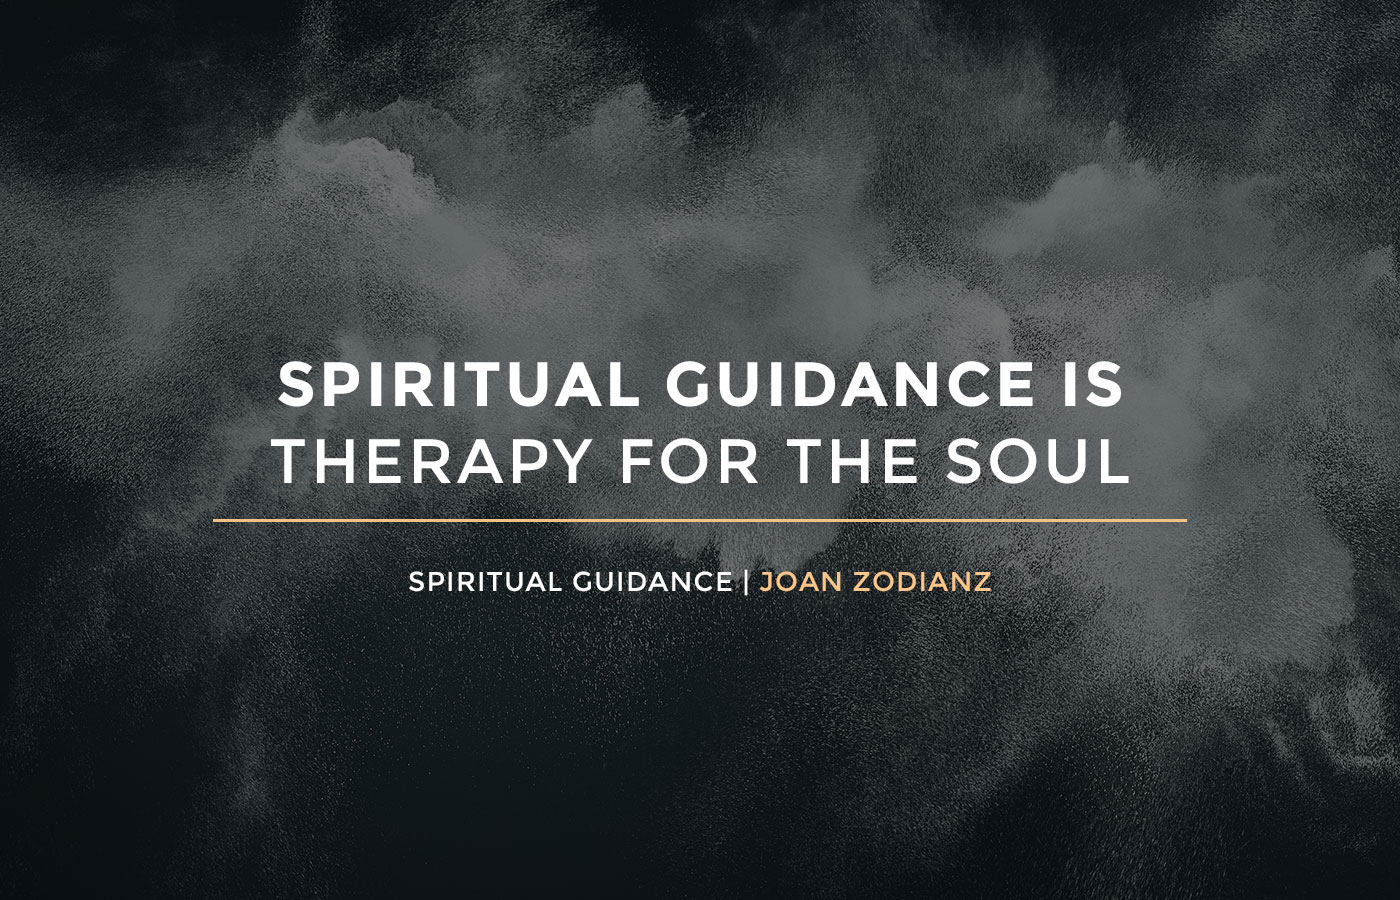 Spiritual Guidance by Joan Zodianz - Book a reading!